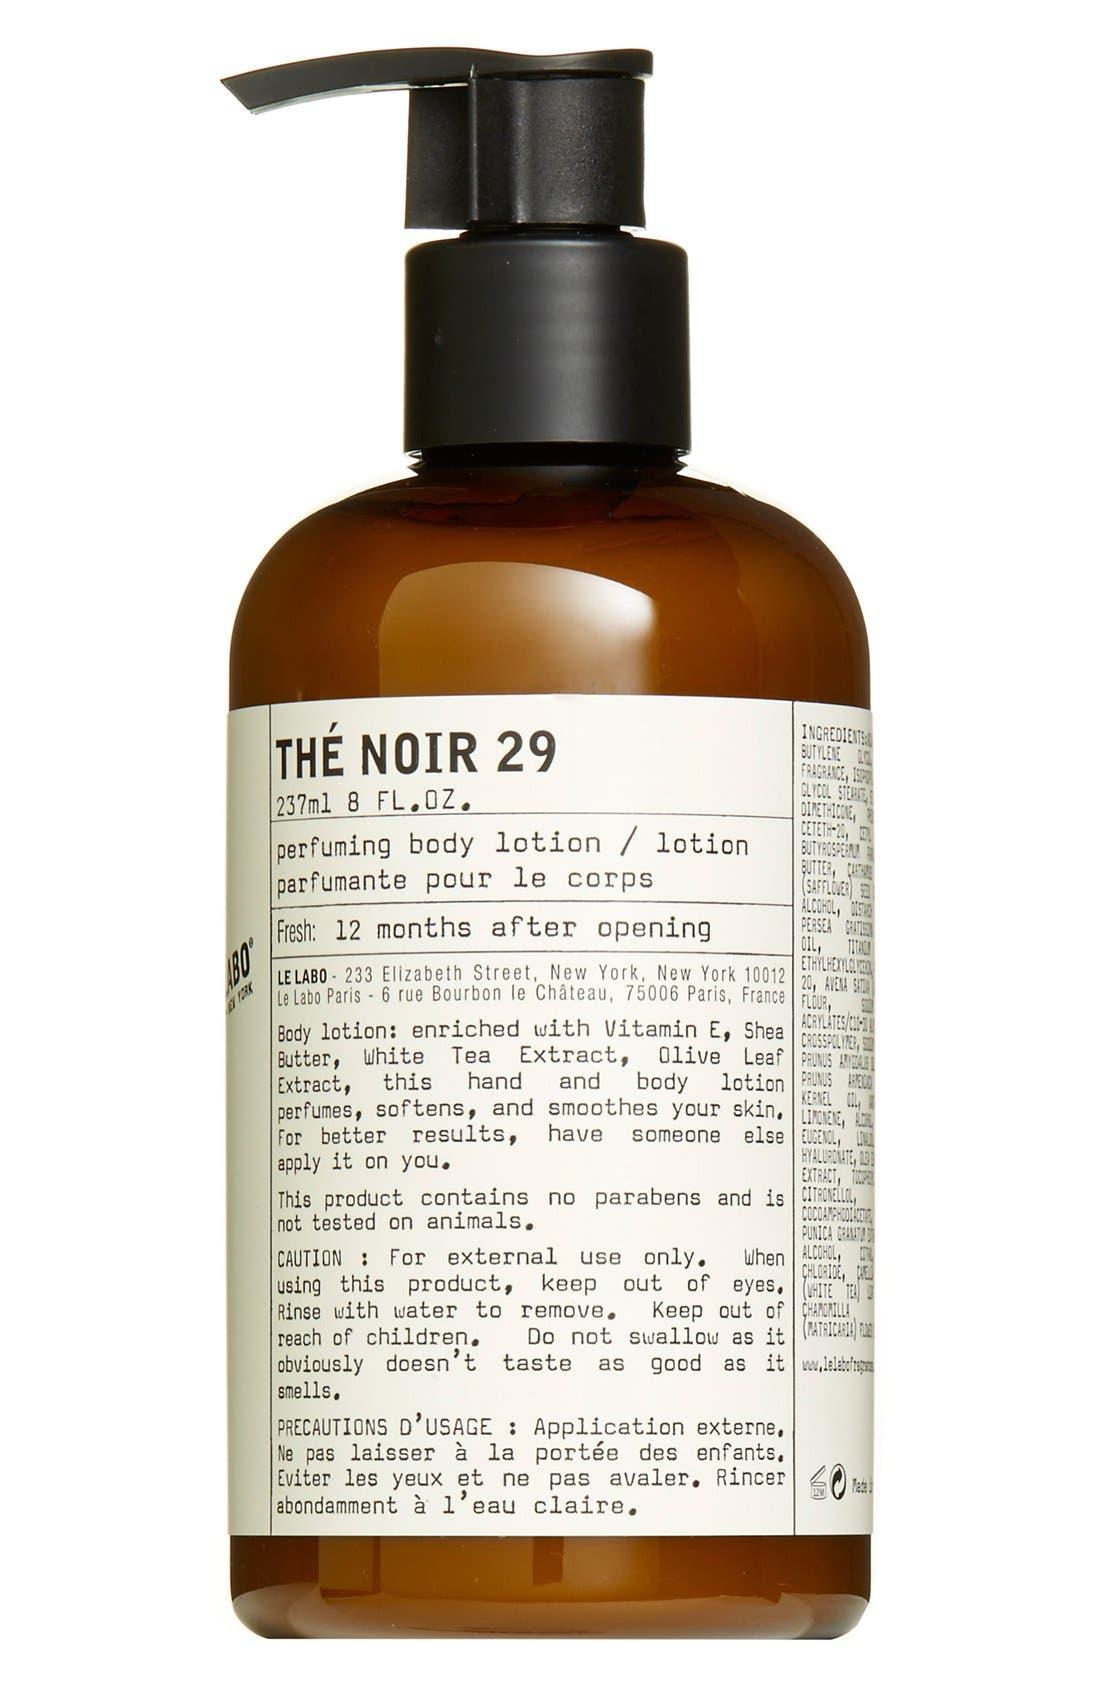 Thé Noir 29 Body Lotion | Nordstrom